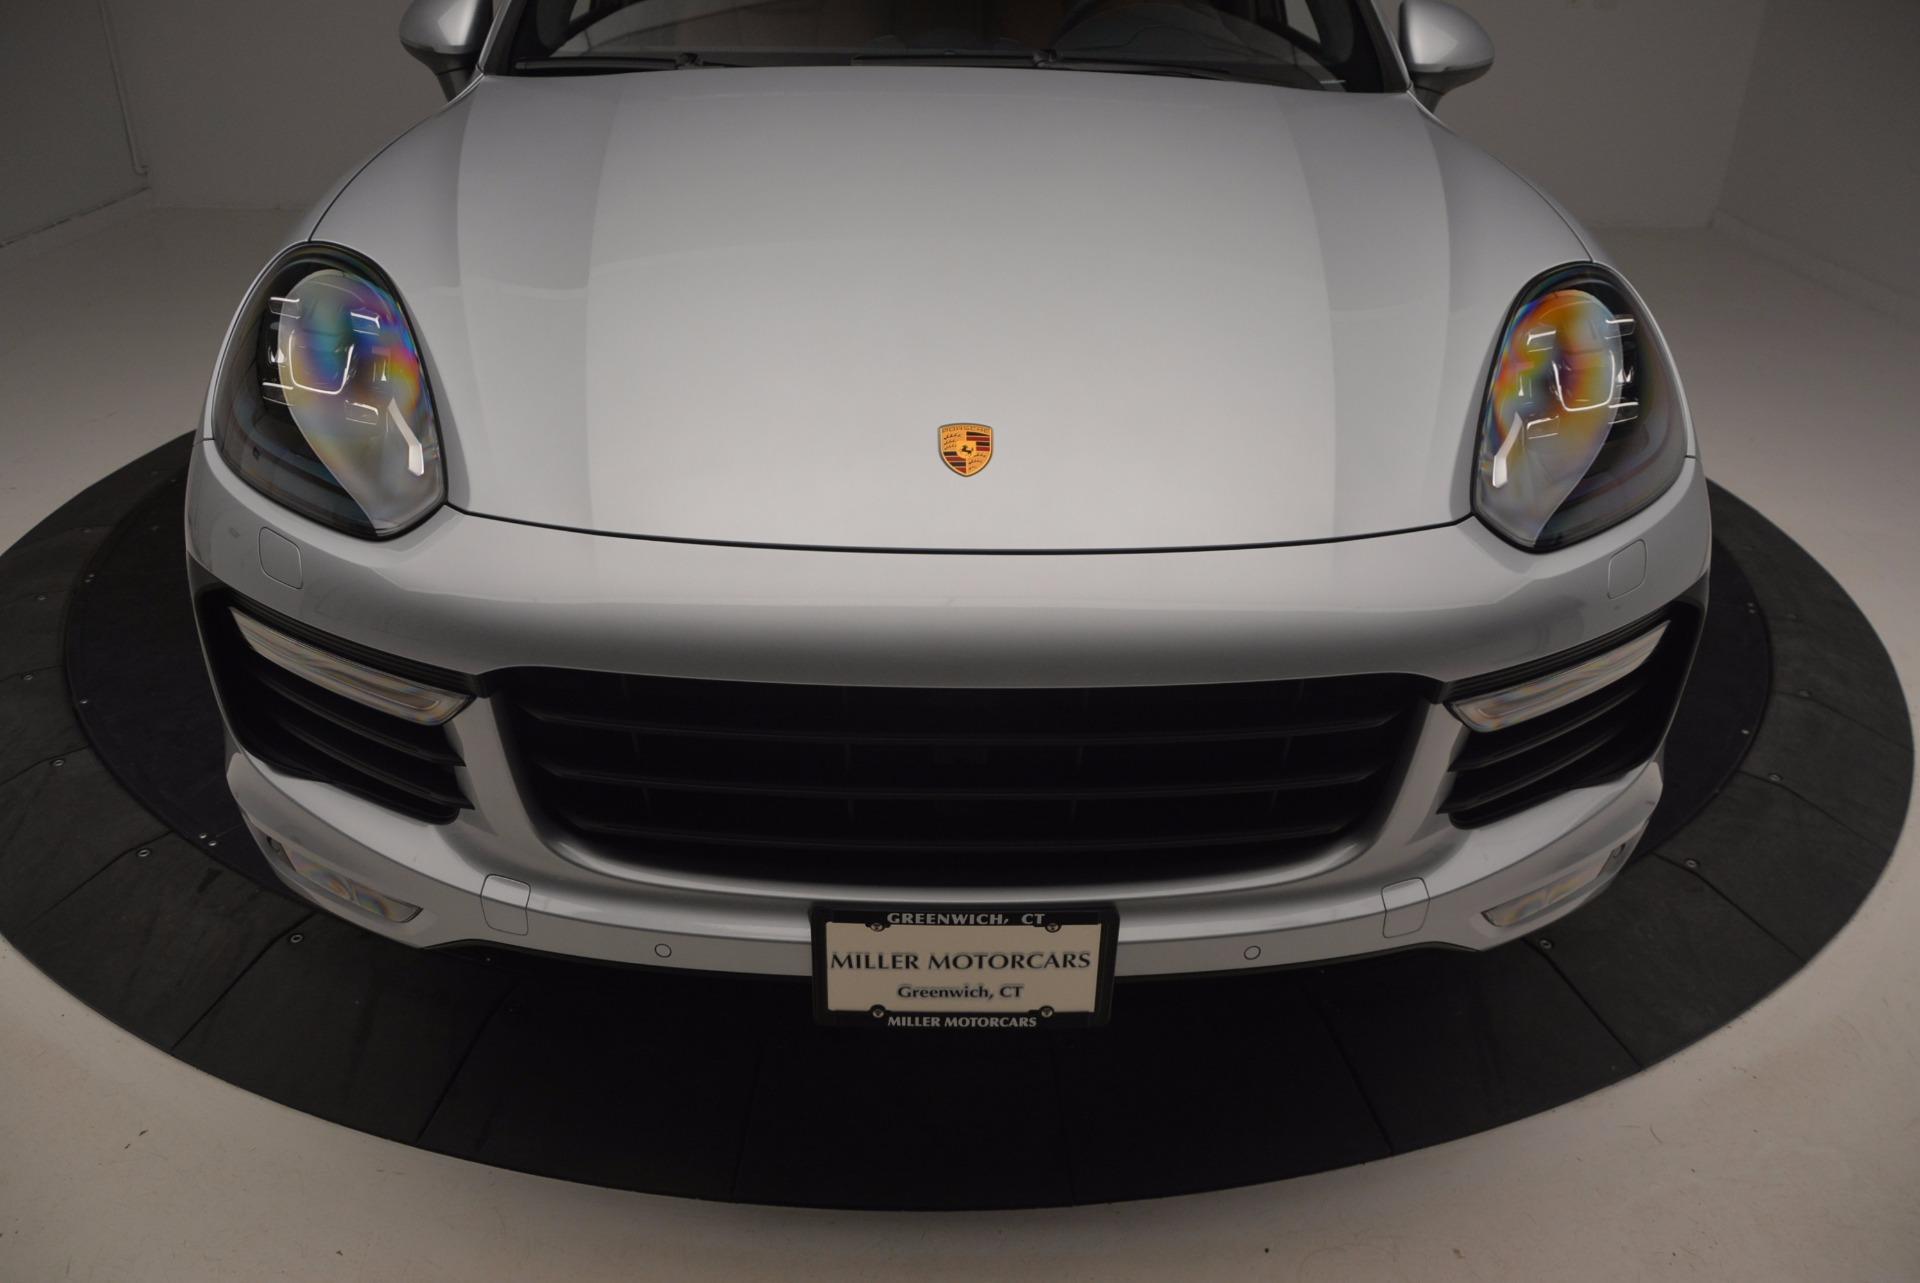 Used 2016 Porsche Cayenne Turbo For Sale In Greenwich, CT. Alfa Romeo of Greenwich, 7165 1000_p13